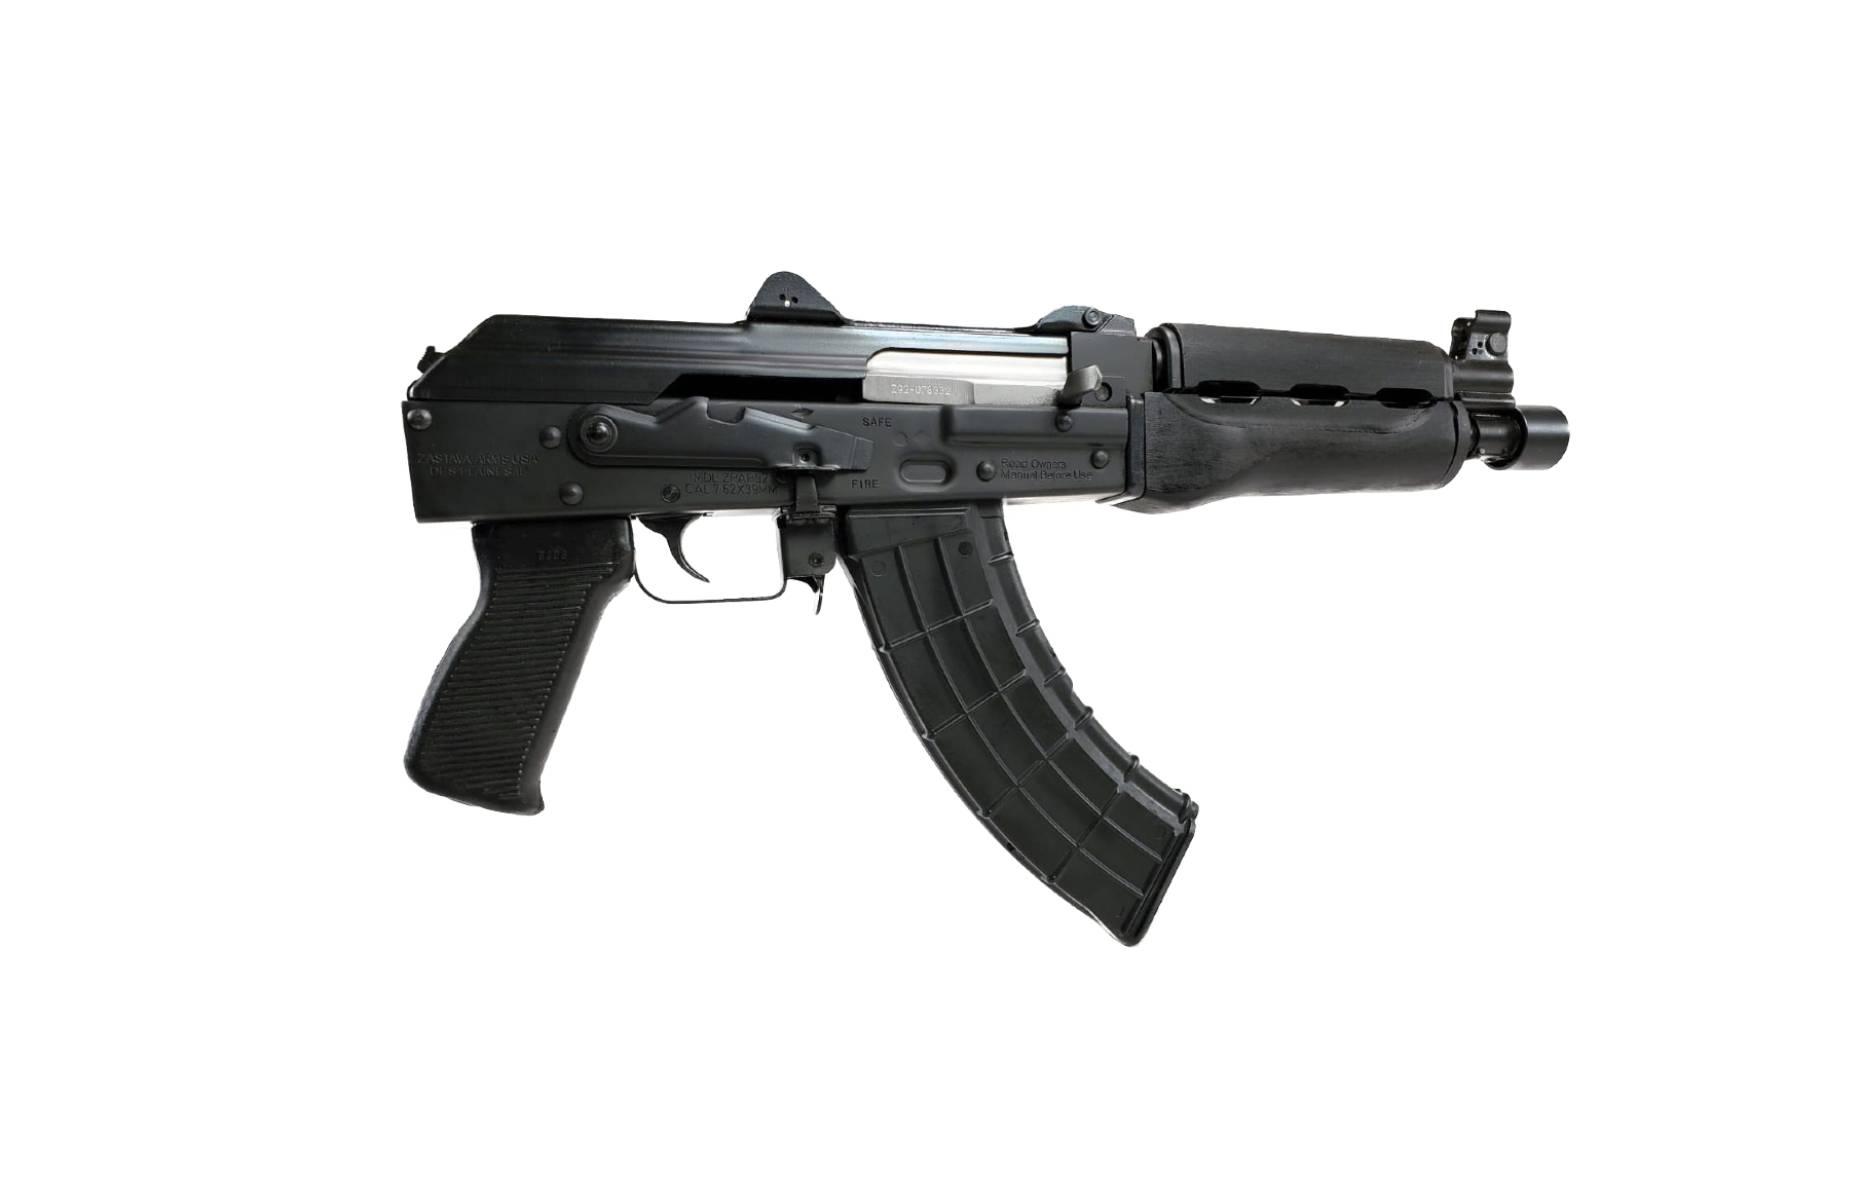 ZASTAVA ARMS USA ZPAP M92 7.62 X 39MM